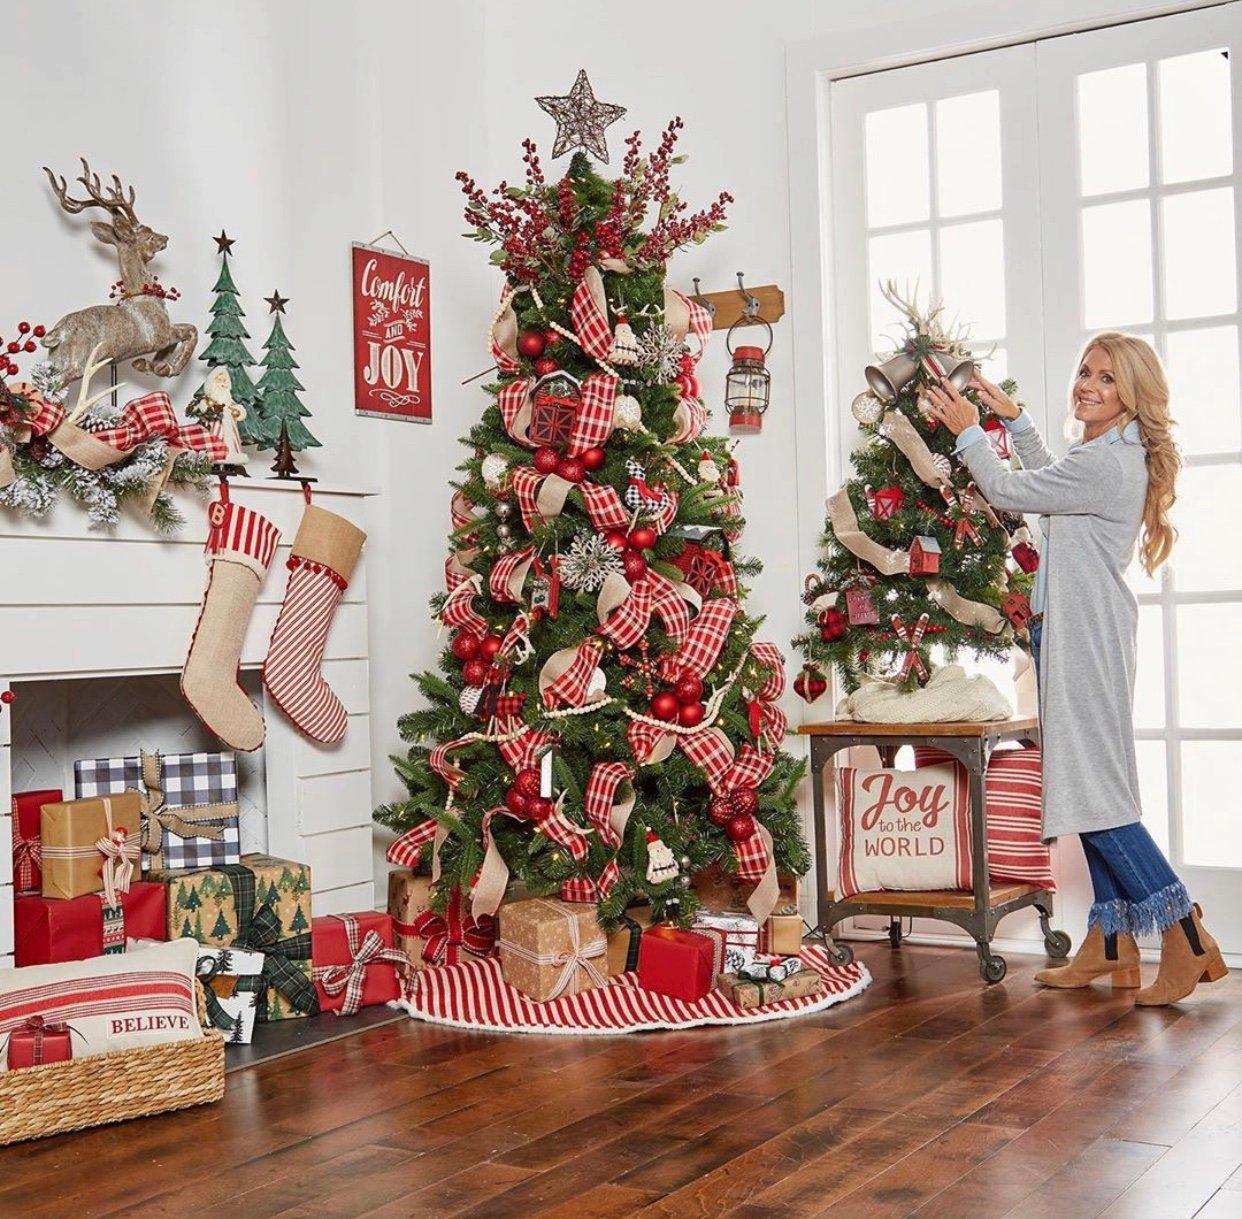 97 Farmhouse Christmas Decor Ideas For Your Home Chaylor Mads